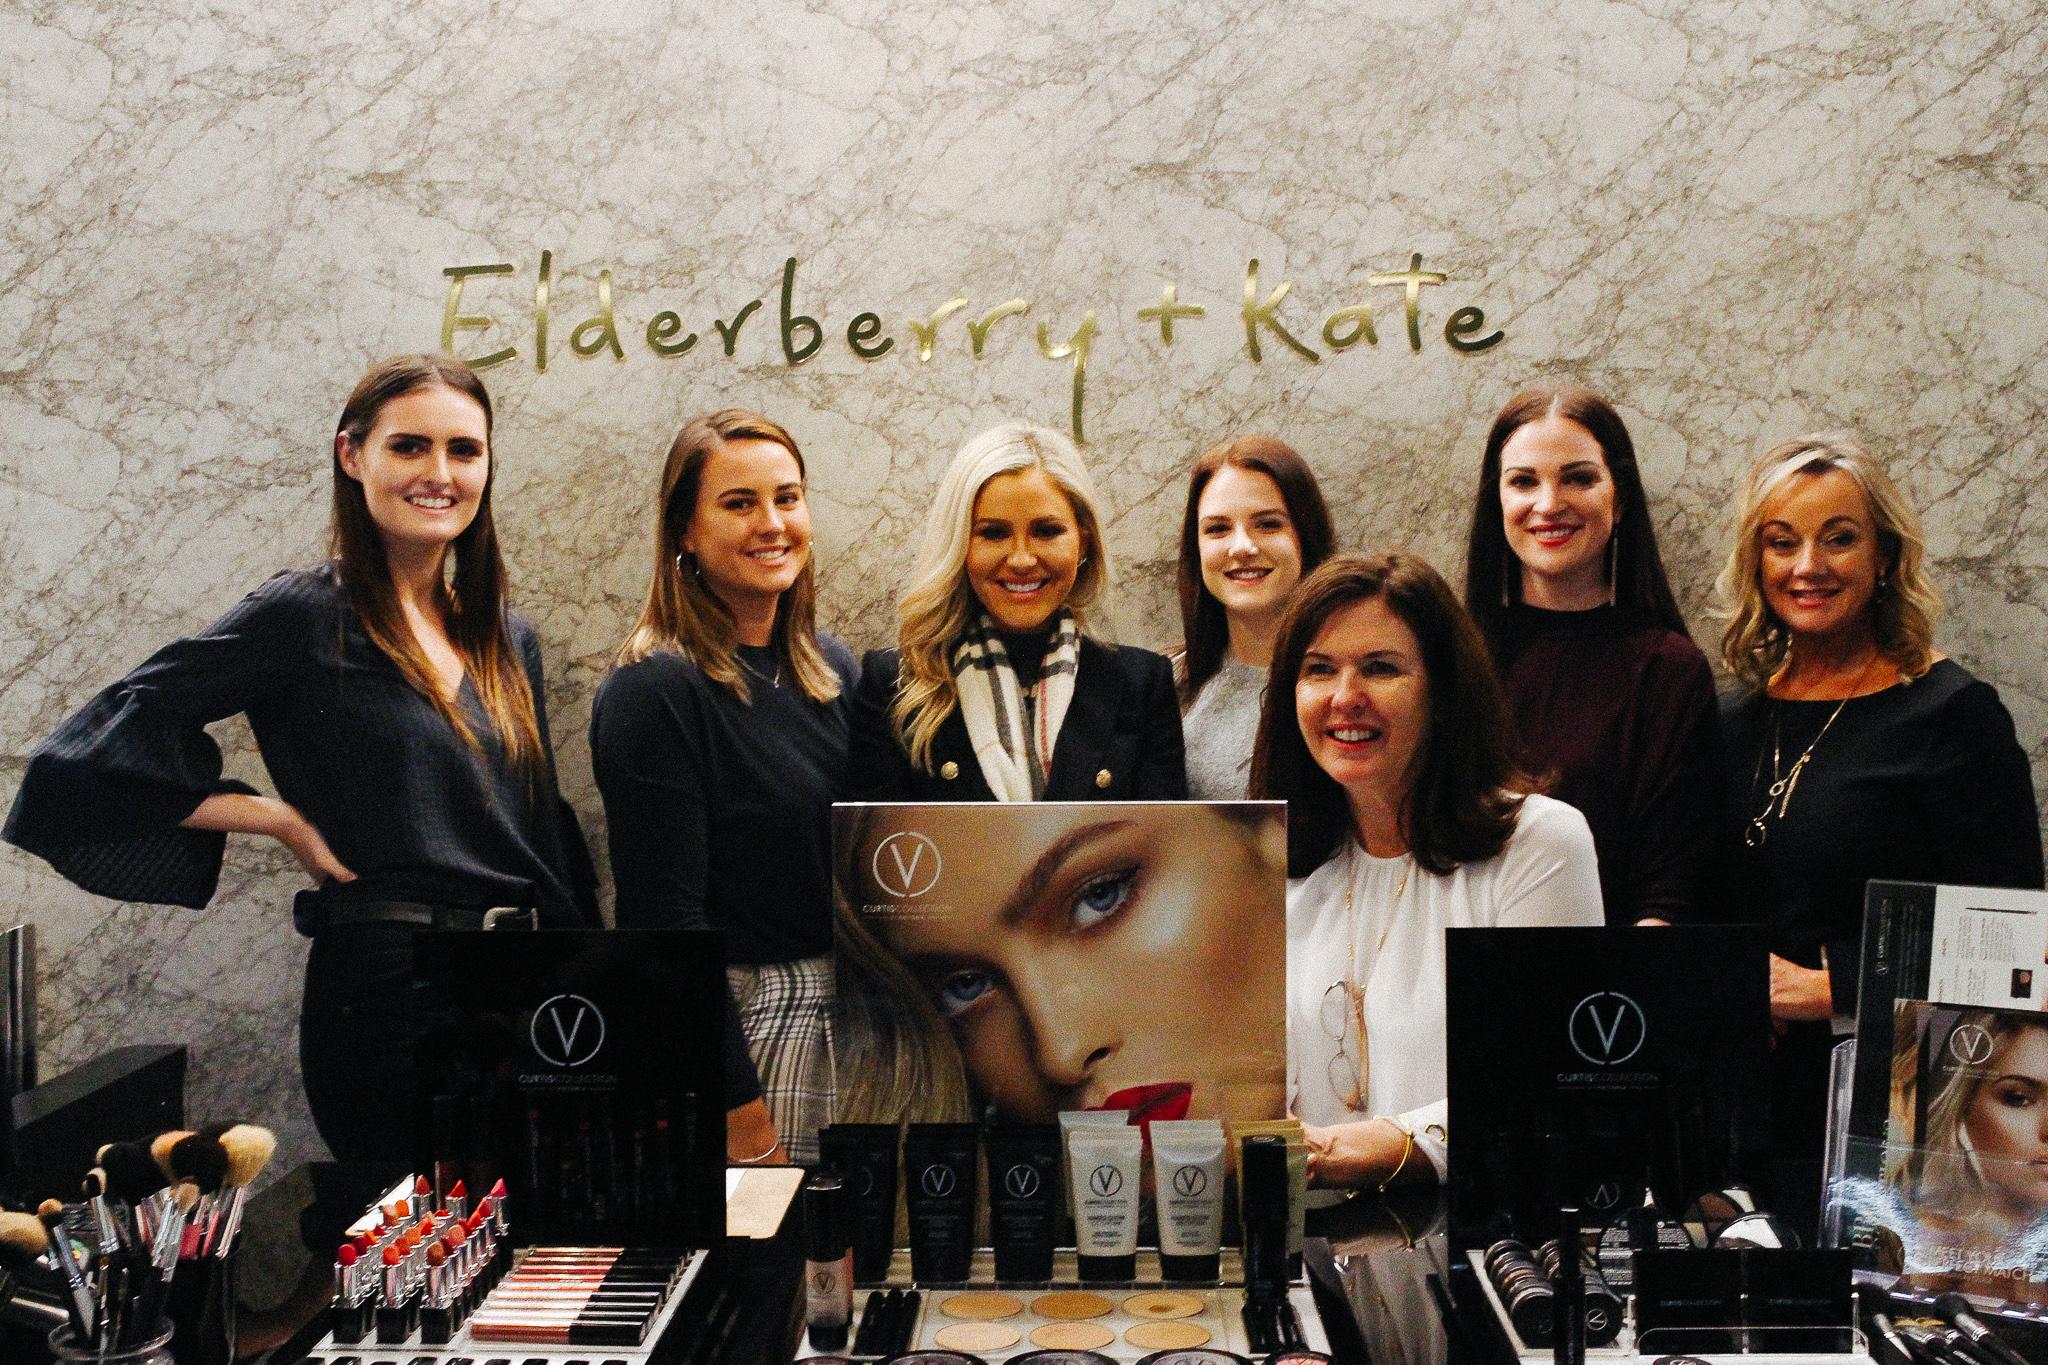 Elderberry and Kate team.jpg